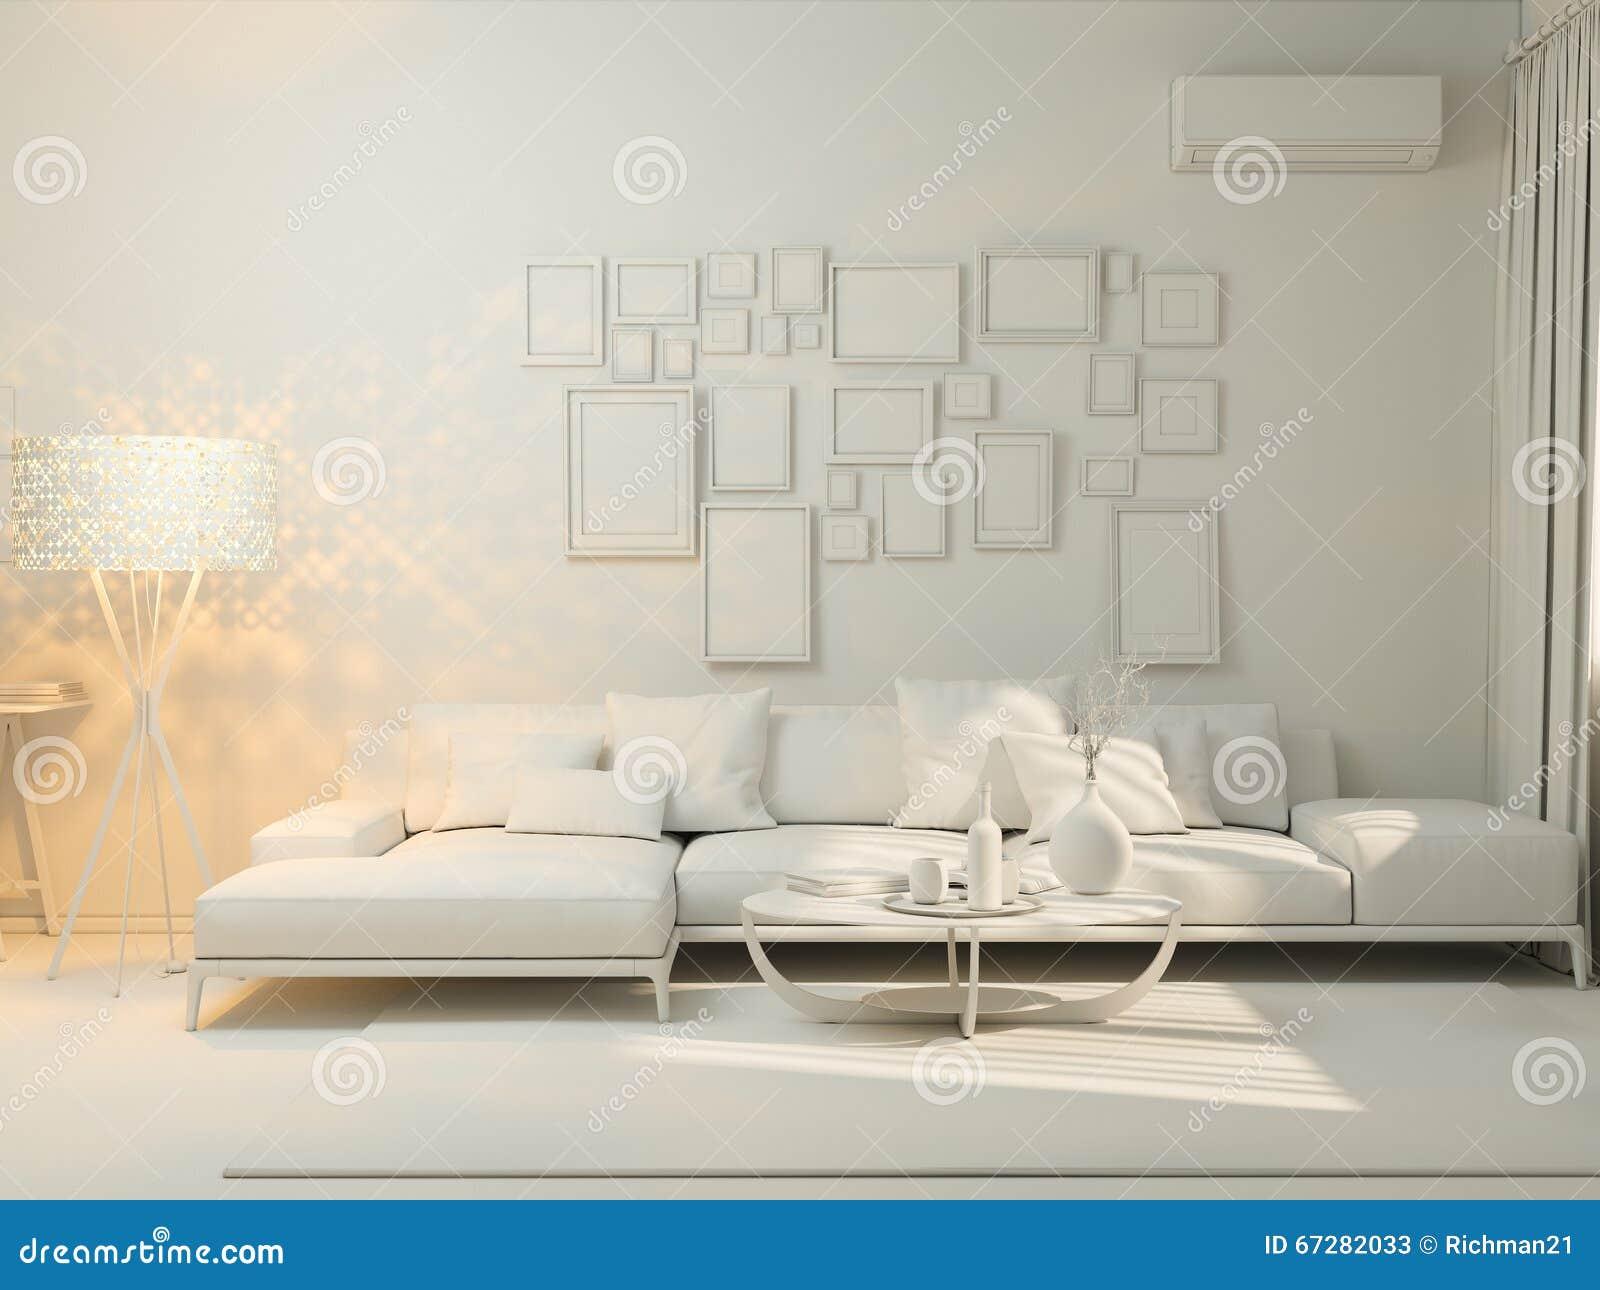 3d Visualization Of Interior Design Living In A Studio